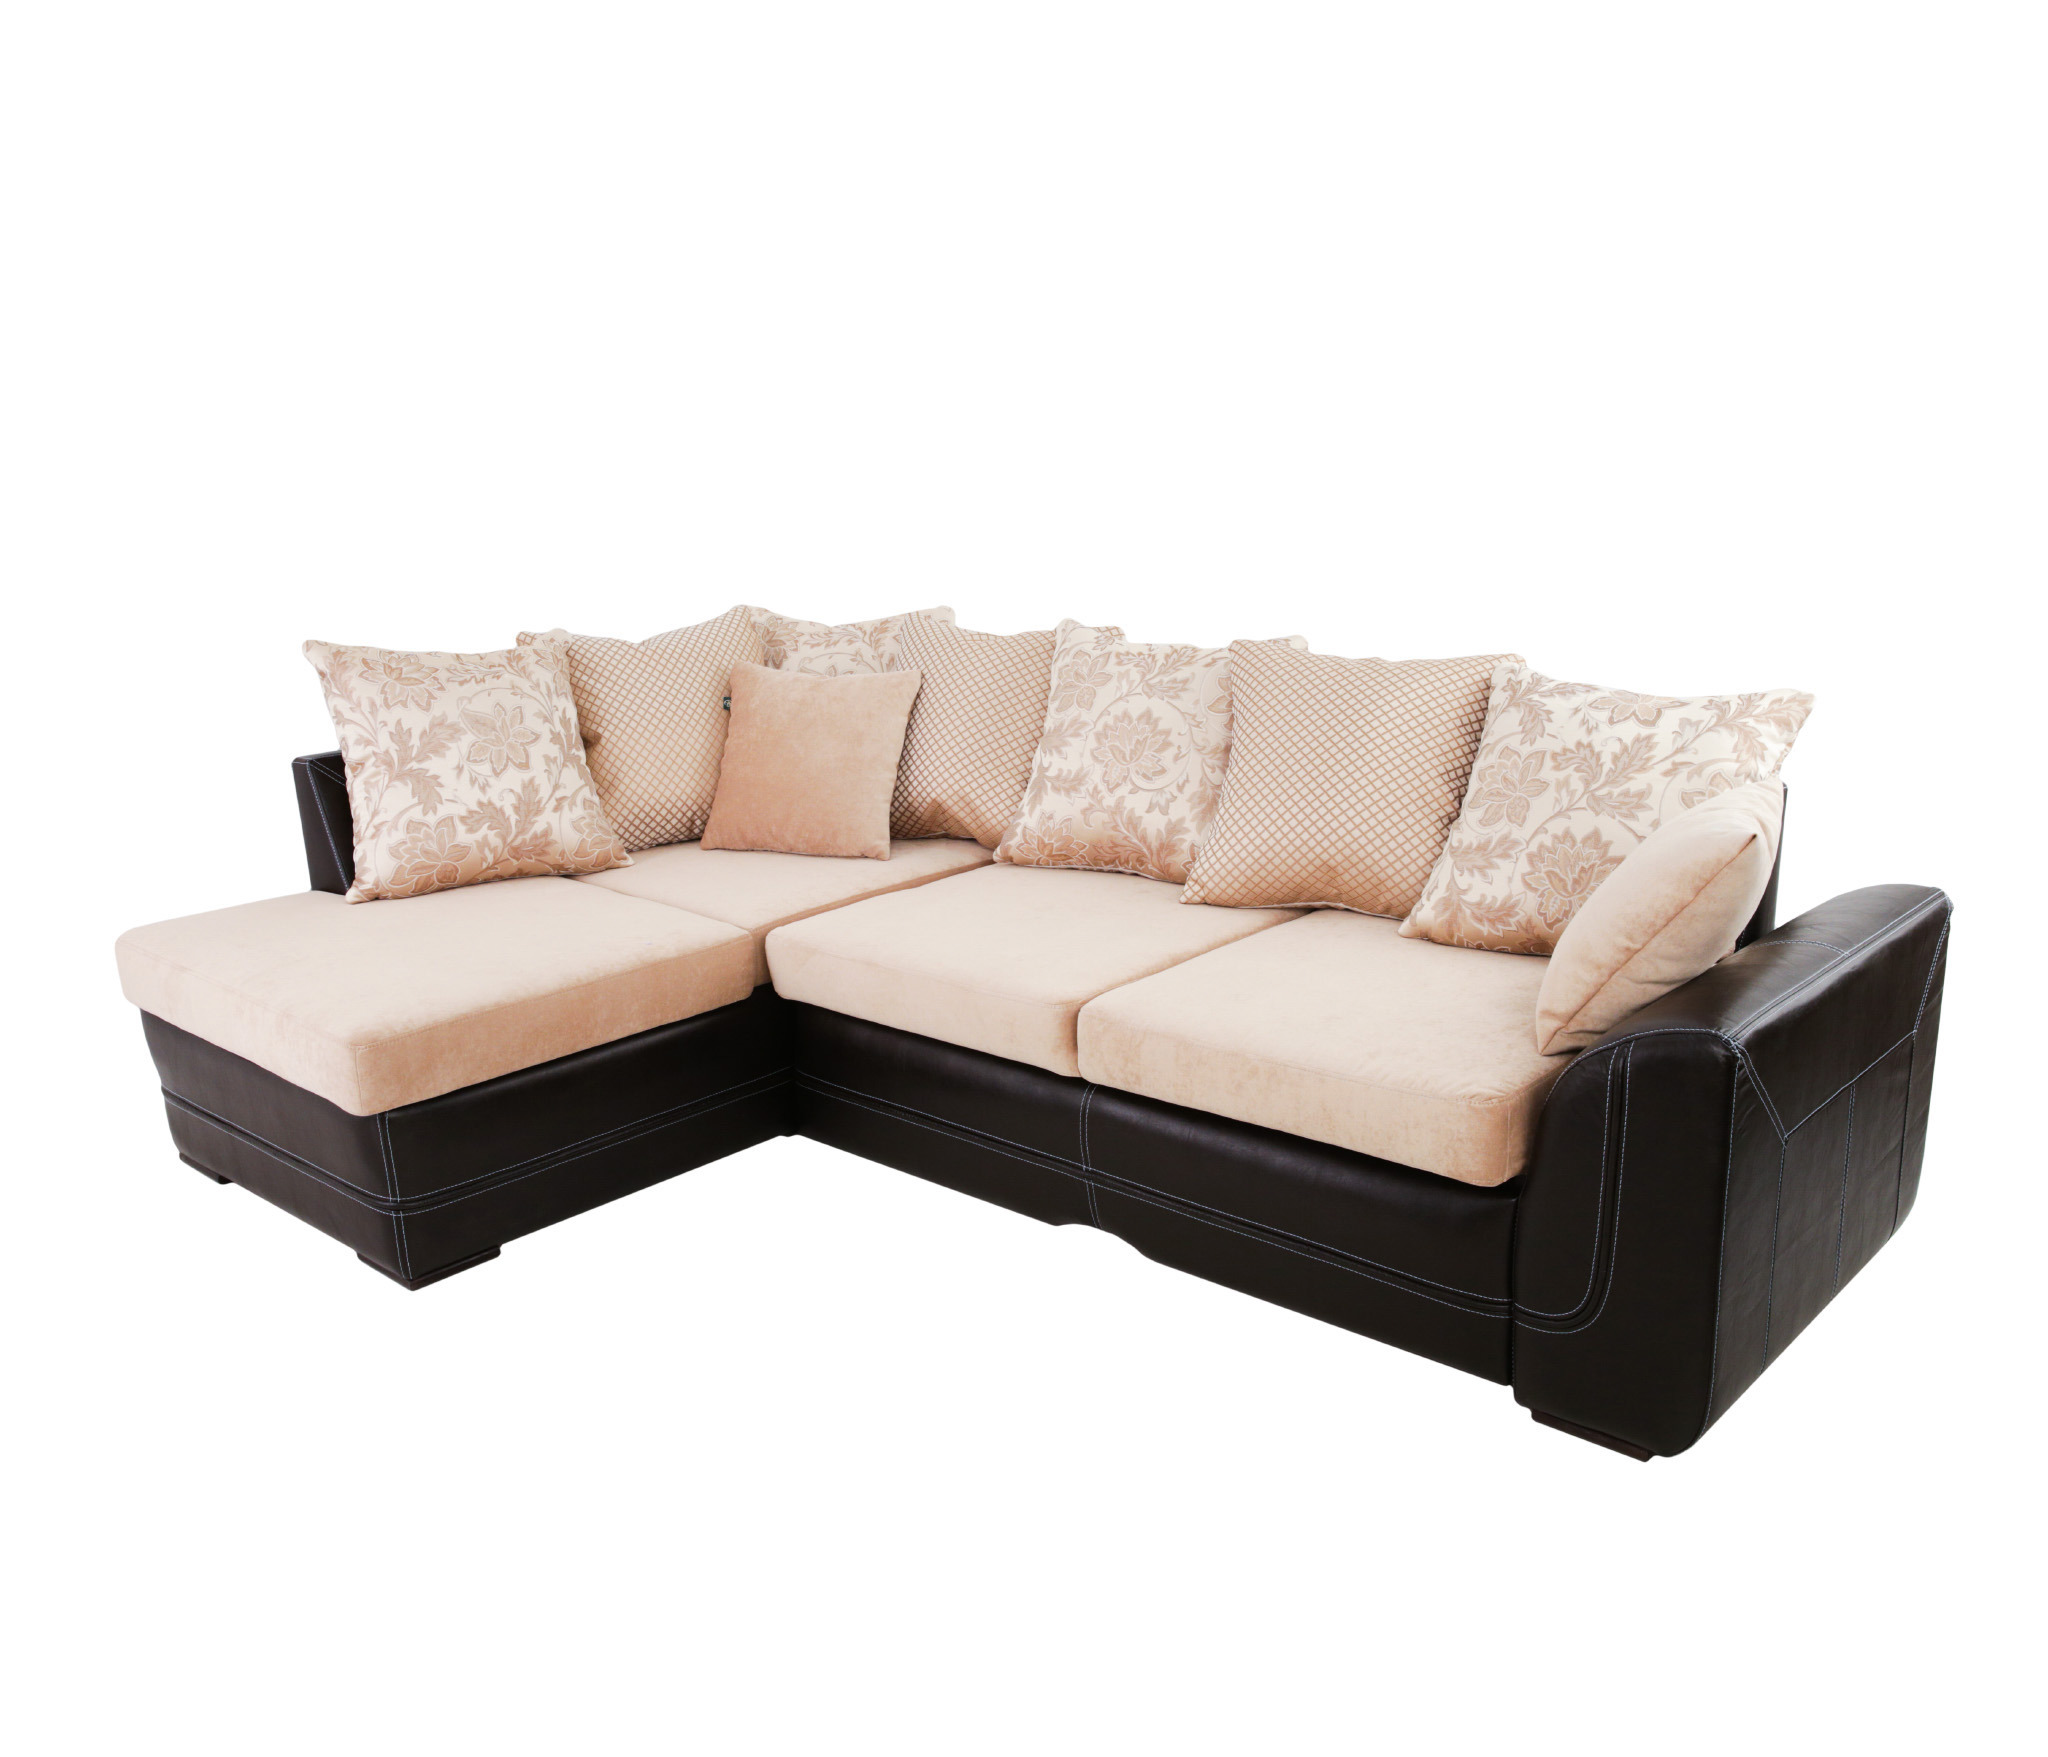 Угловой диван РАПСОДИЯ  левыйМягкая мебель<br><br><br>Длина мм: 2800<br>Высота мм: 760<br>Глубина мм: 1900